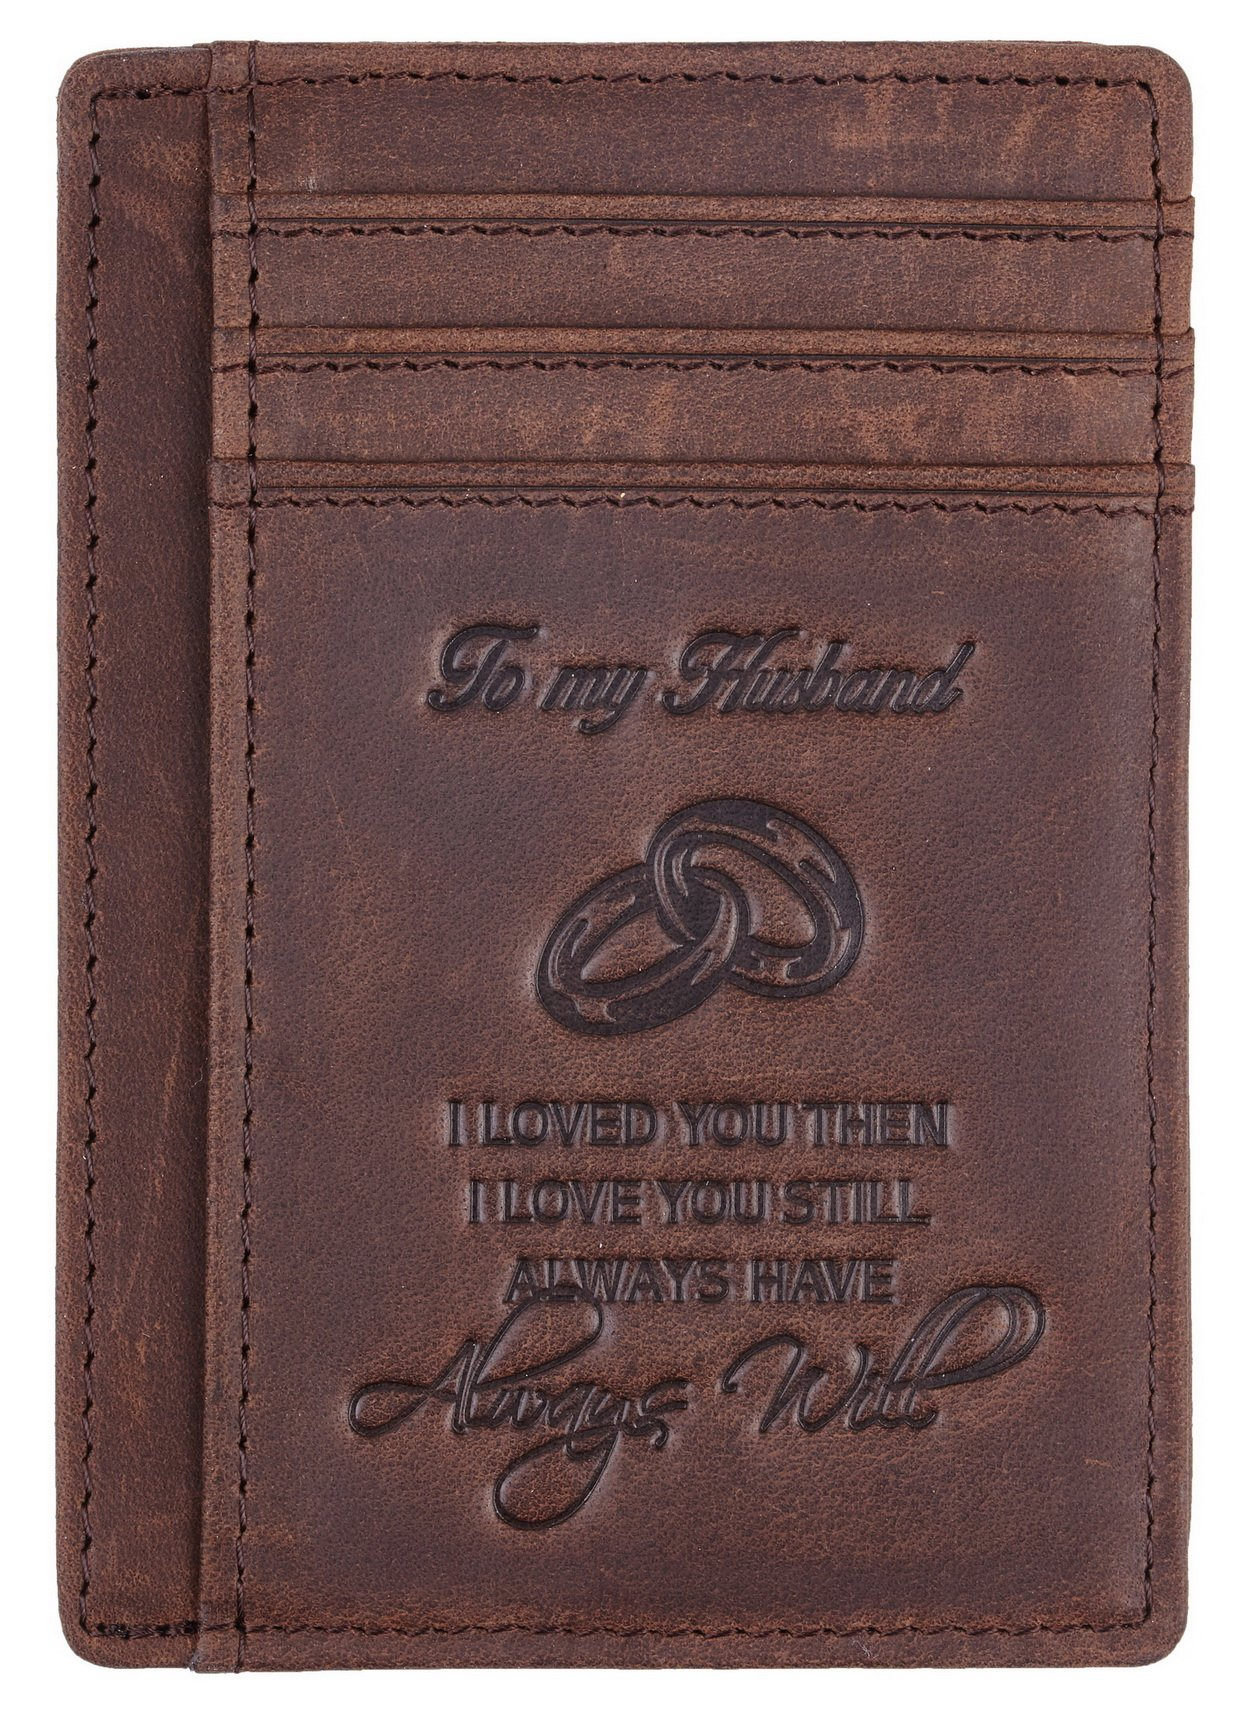 NapaWalli Wife To Husband Gift Best Anniversary Birthday Gifts For Him Genuine Leather RFID Blocking slim Wallet Card Holder (Hunter Coffee) by NapaWalli (Image #4)